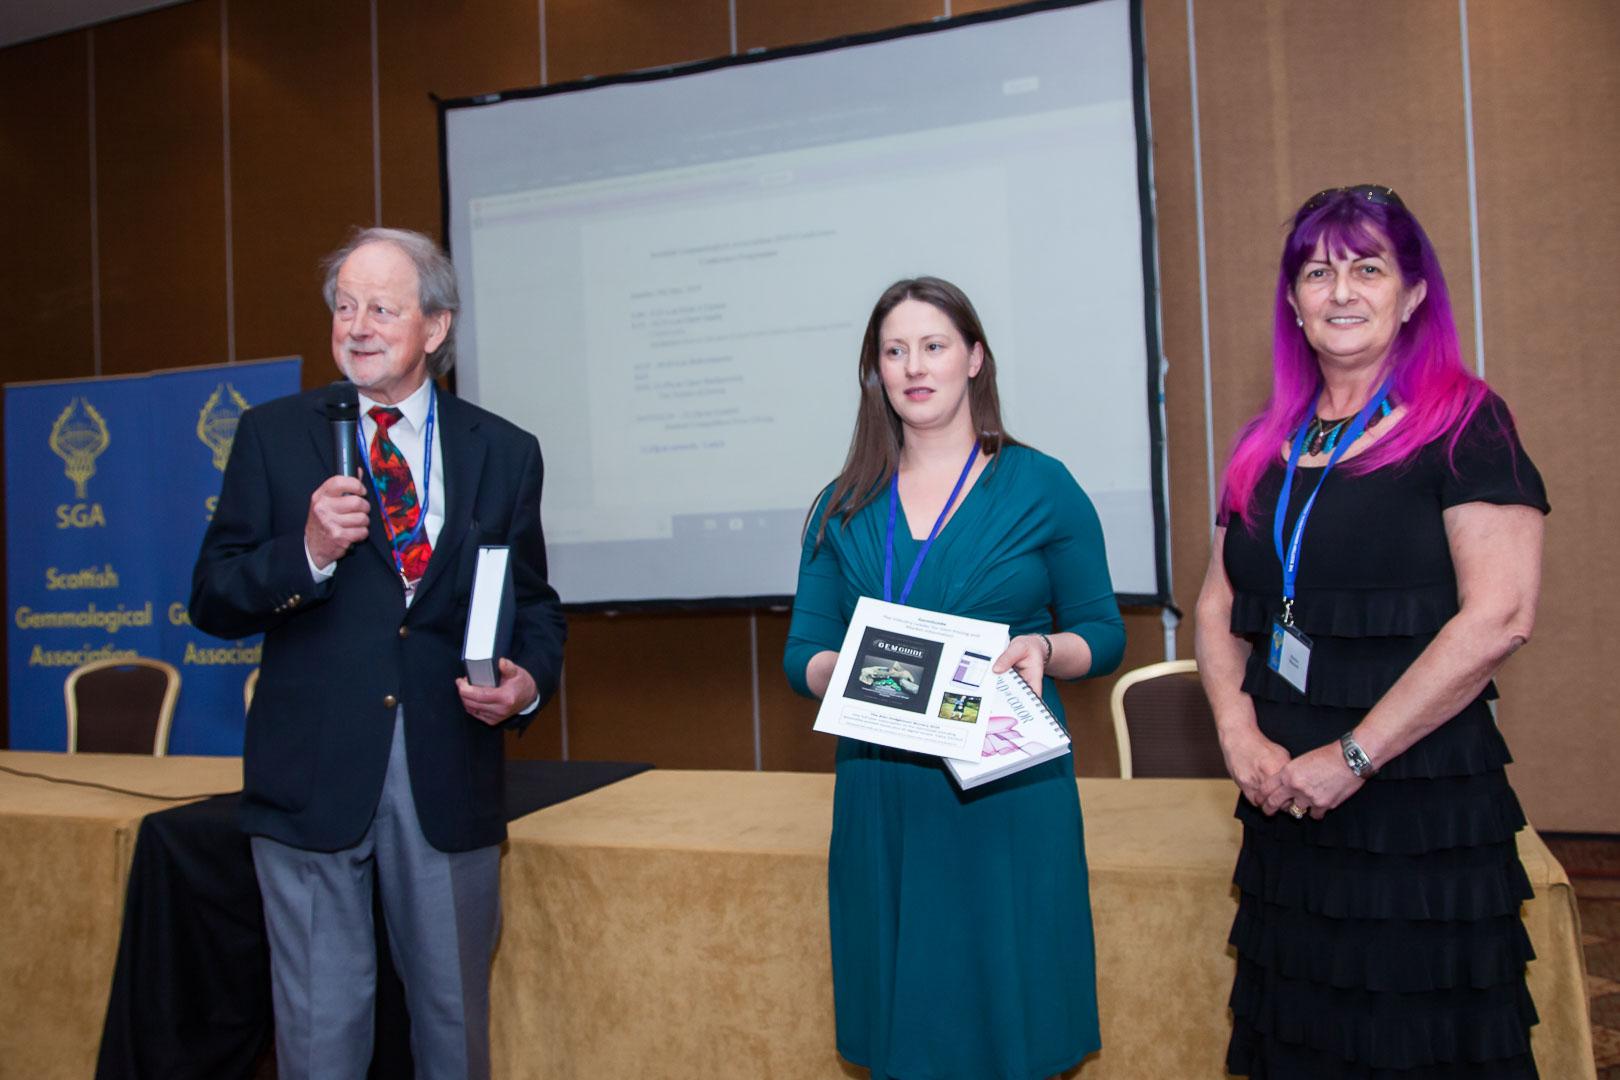 SGA Conference 2019-6419.jpg